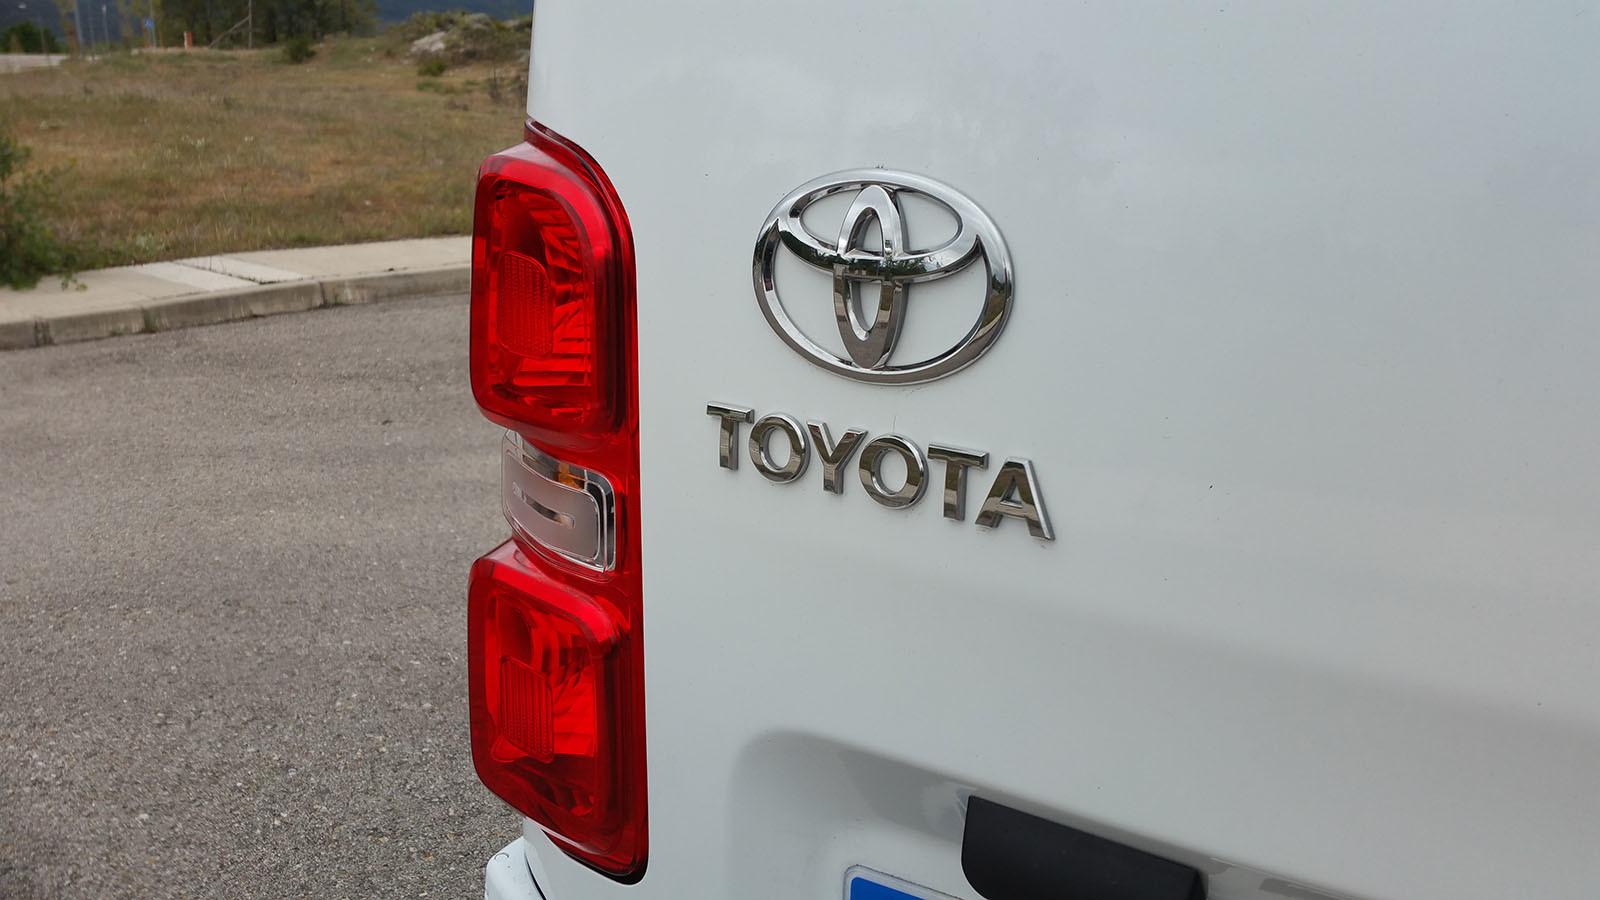 Toyota PROACE furgón - Detalles